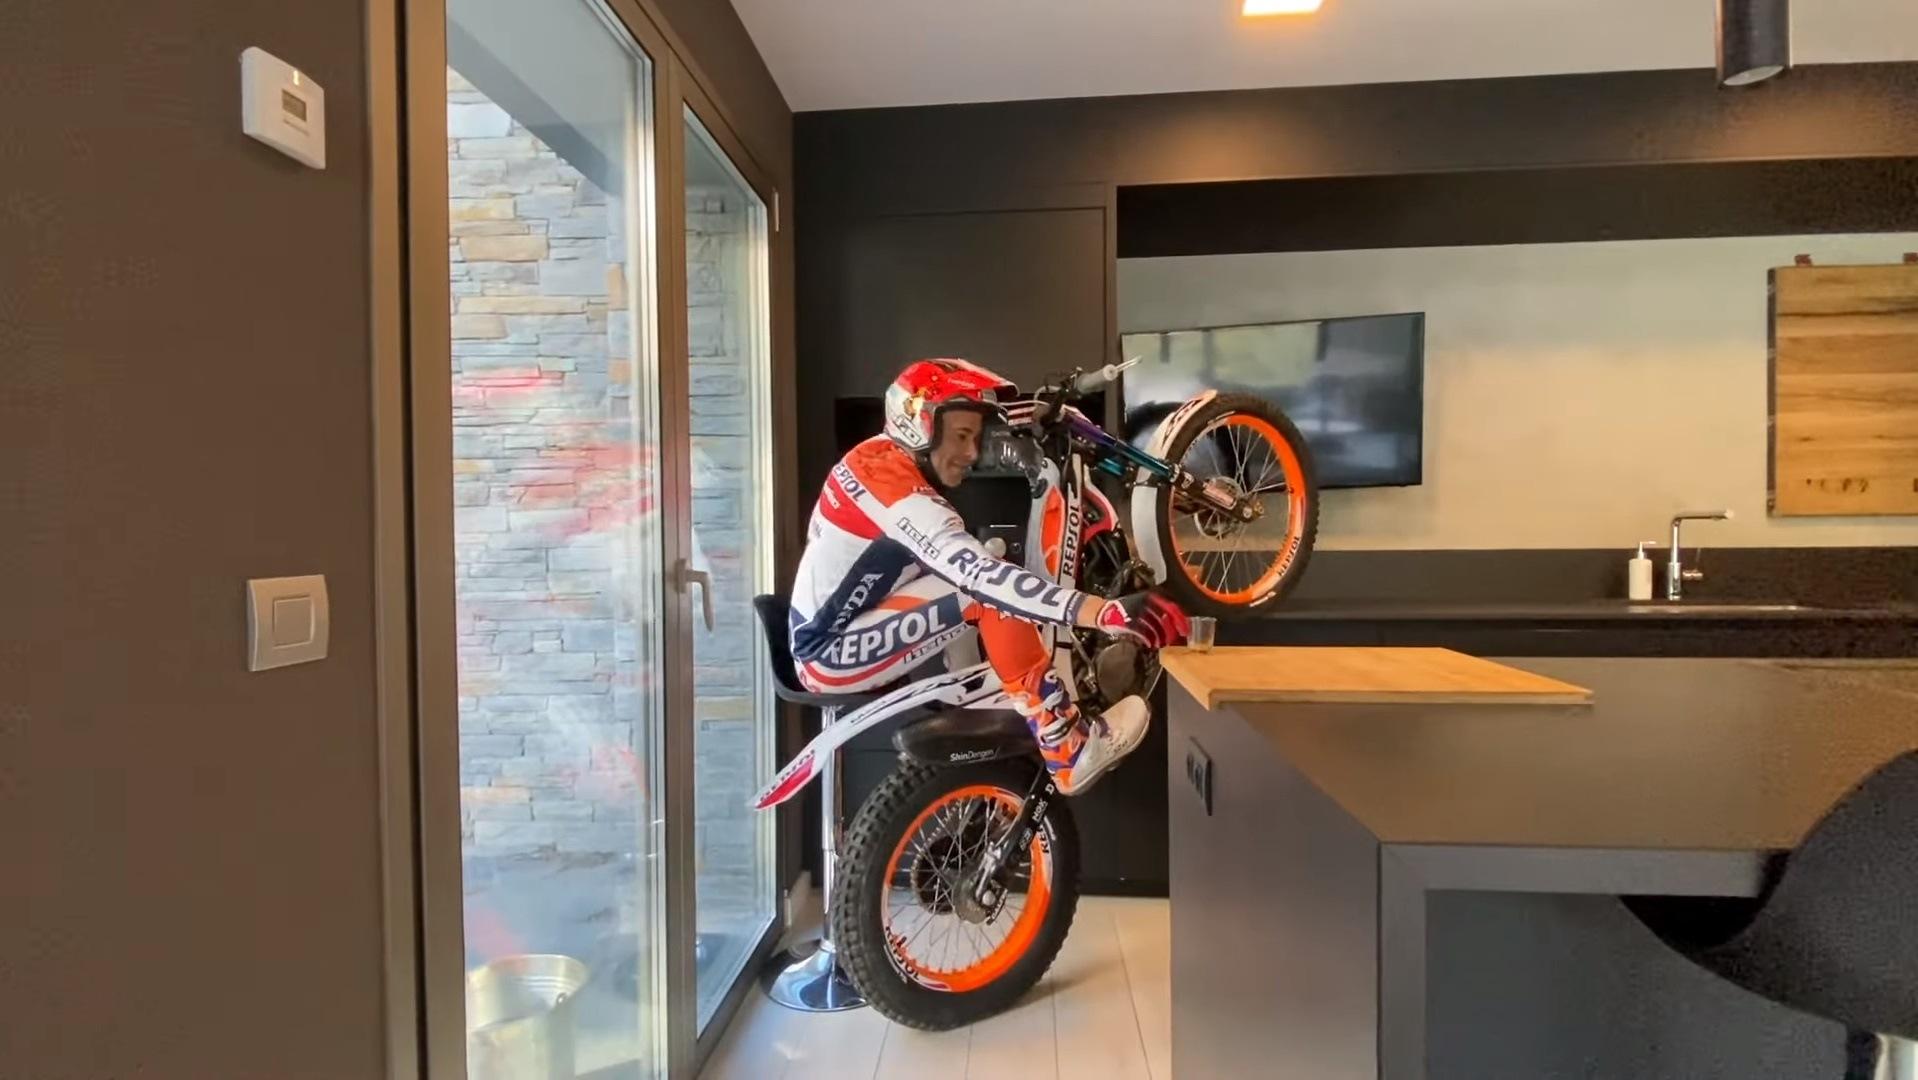 Toni Bou guarda cuarentena, pero entrena dentro de casa ¡con la moto!